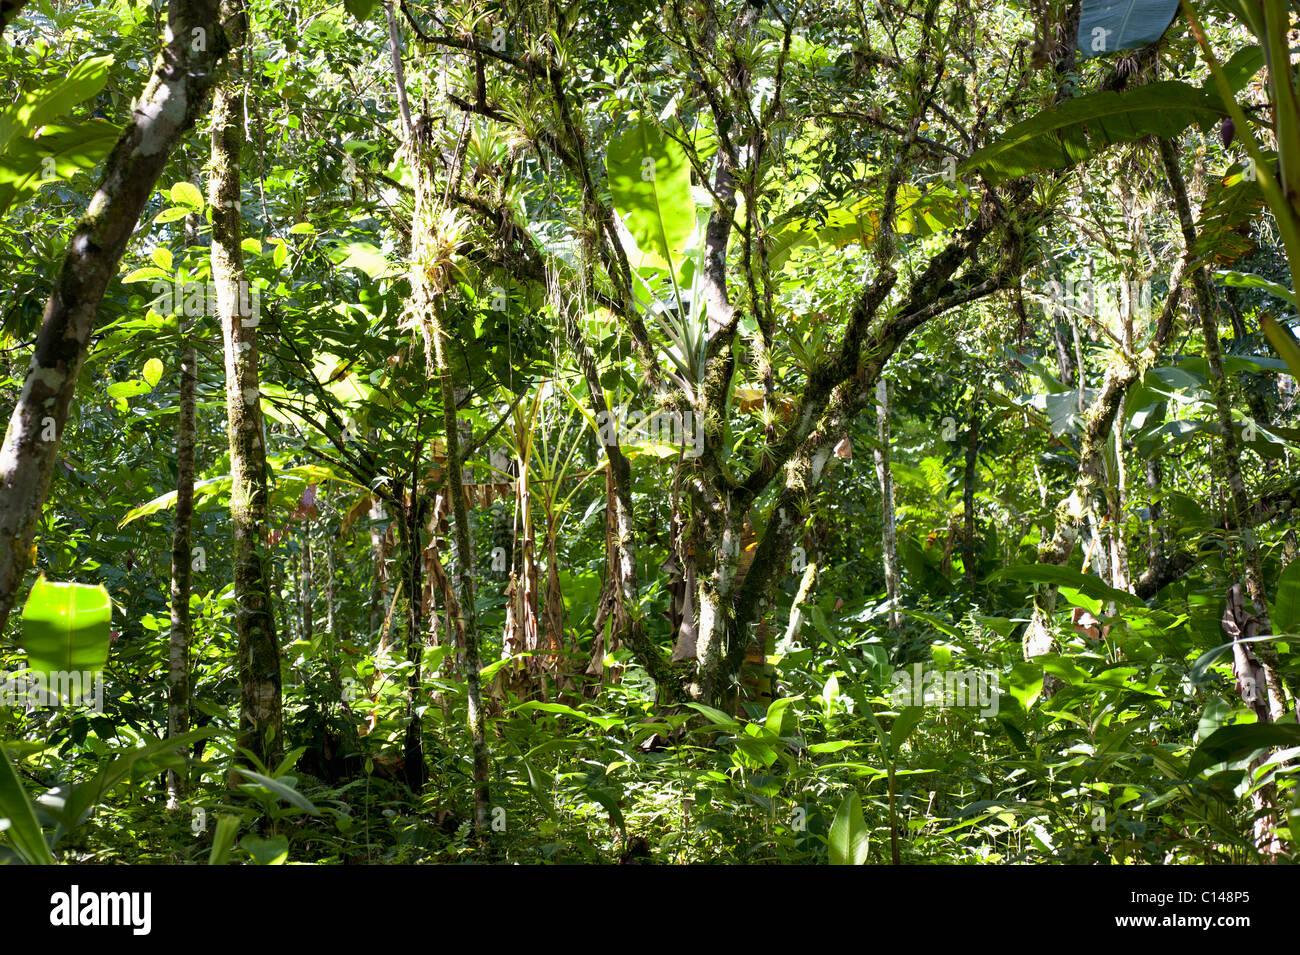 Amazon Rainforest, Brazil, South America. Stock Photo